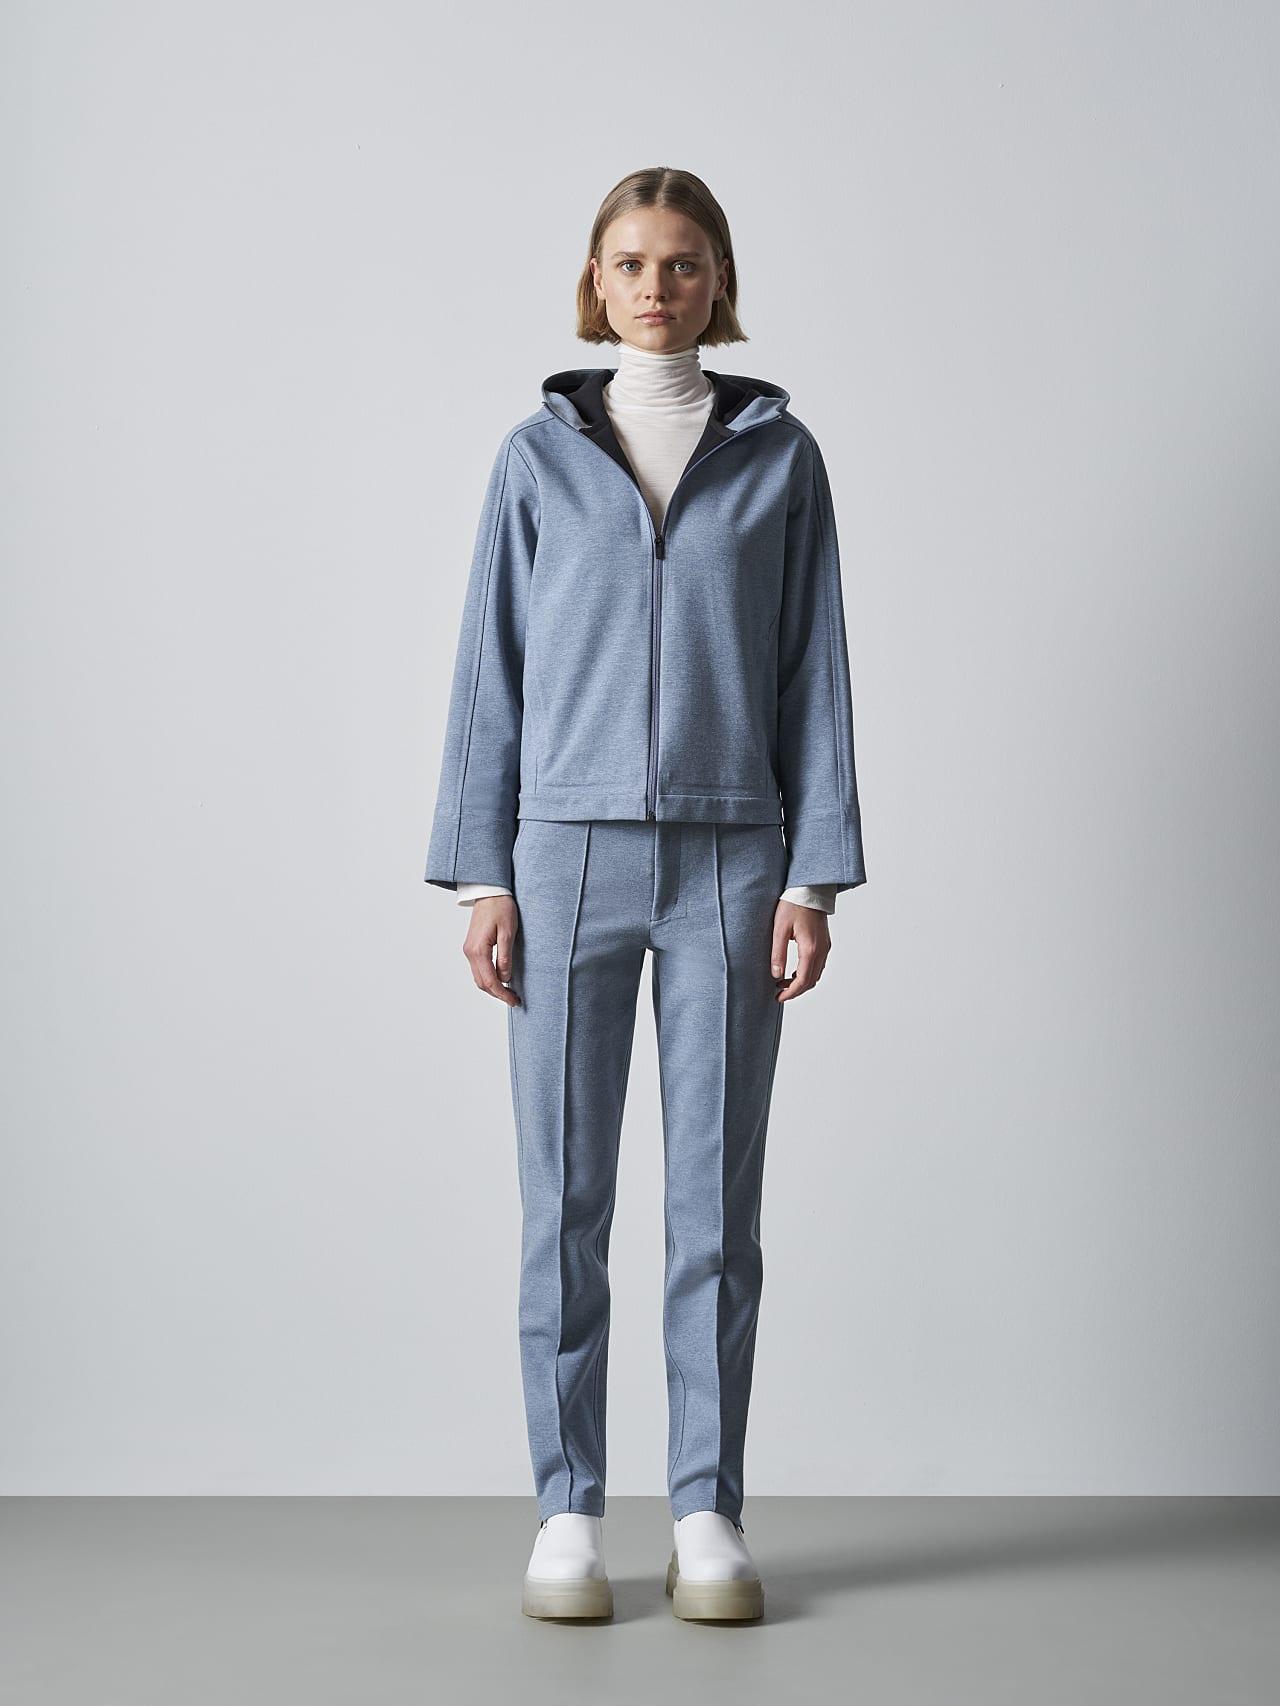 SINNO V2.Y5.02 Waterproof Hooded Jacket medium blue Front Alpha Tauri